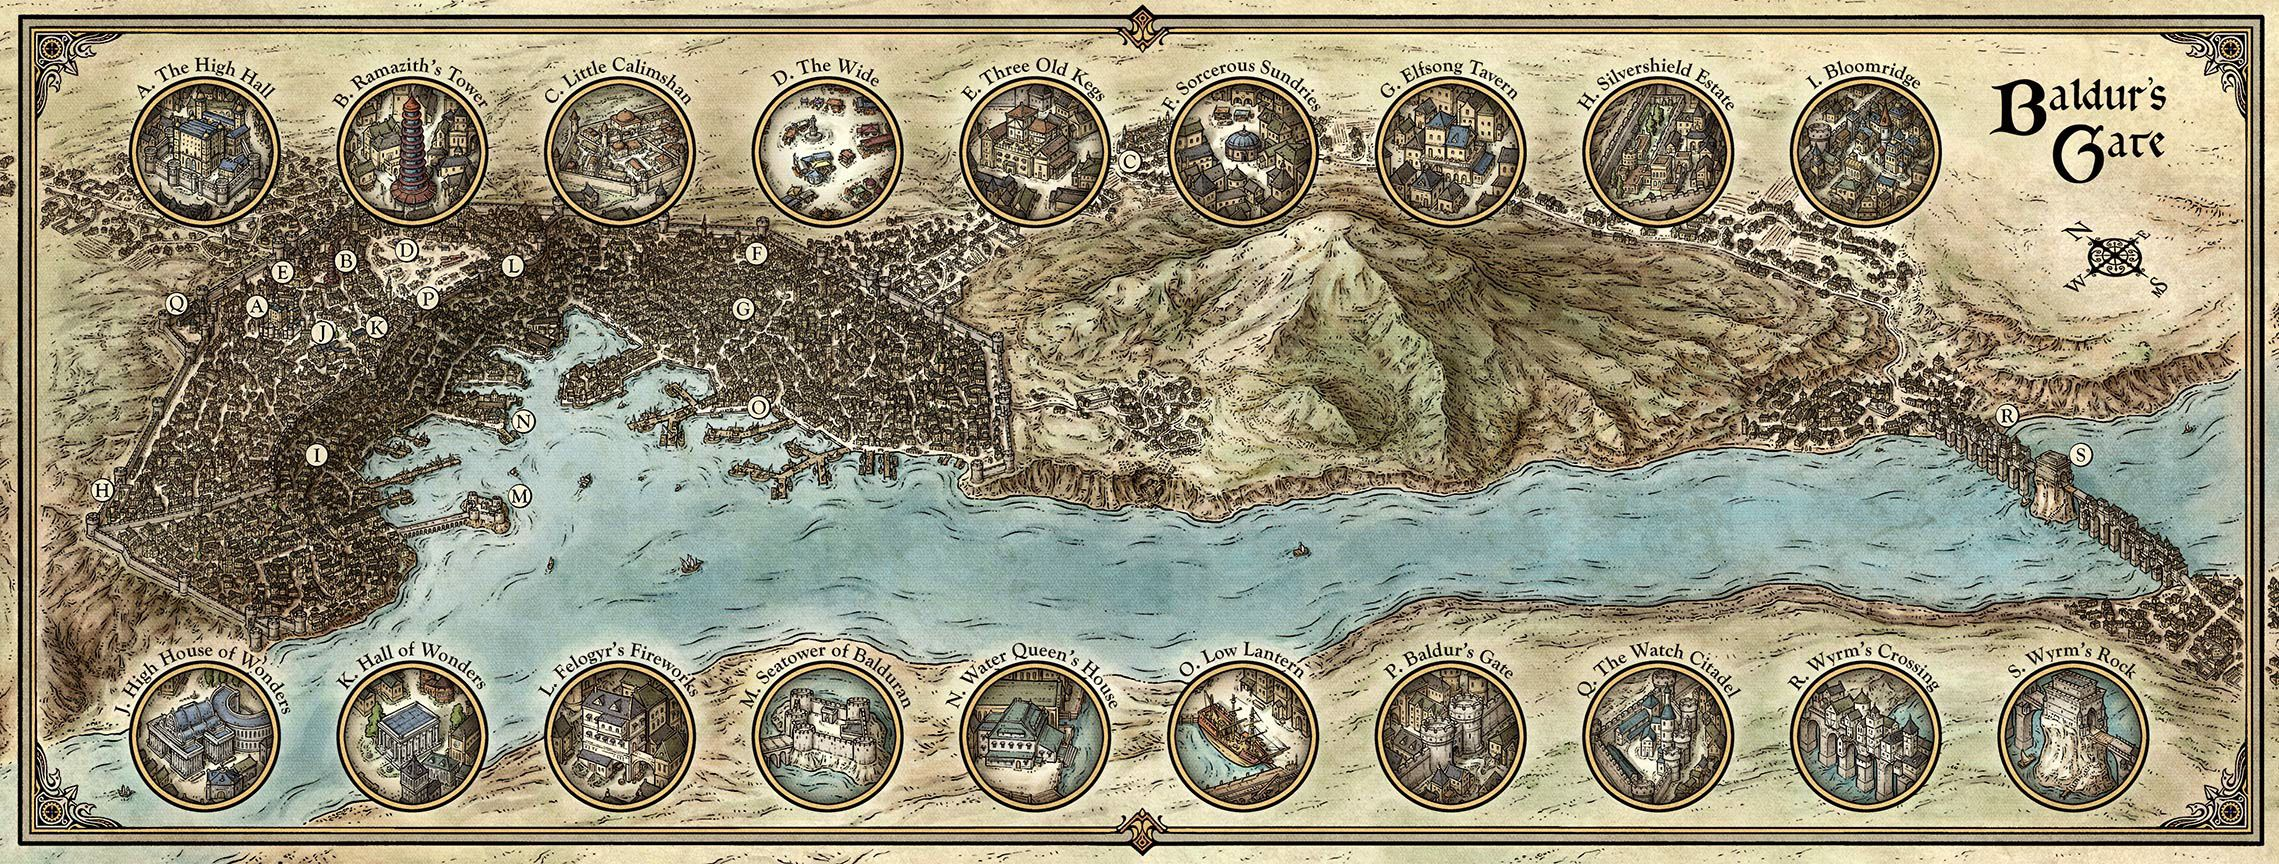 Baldurs_Gate_Map